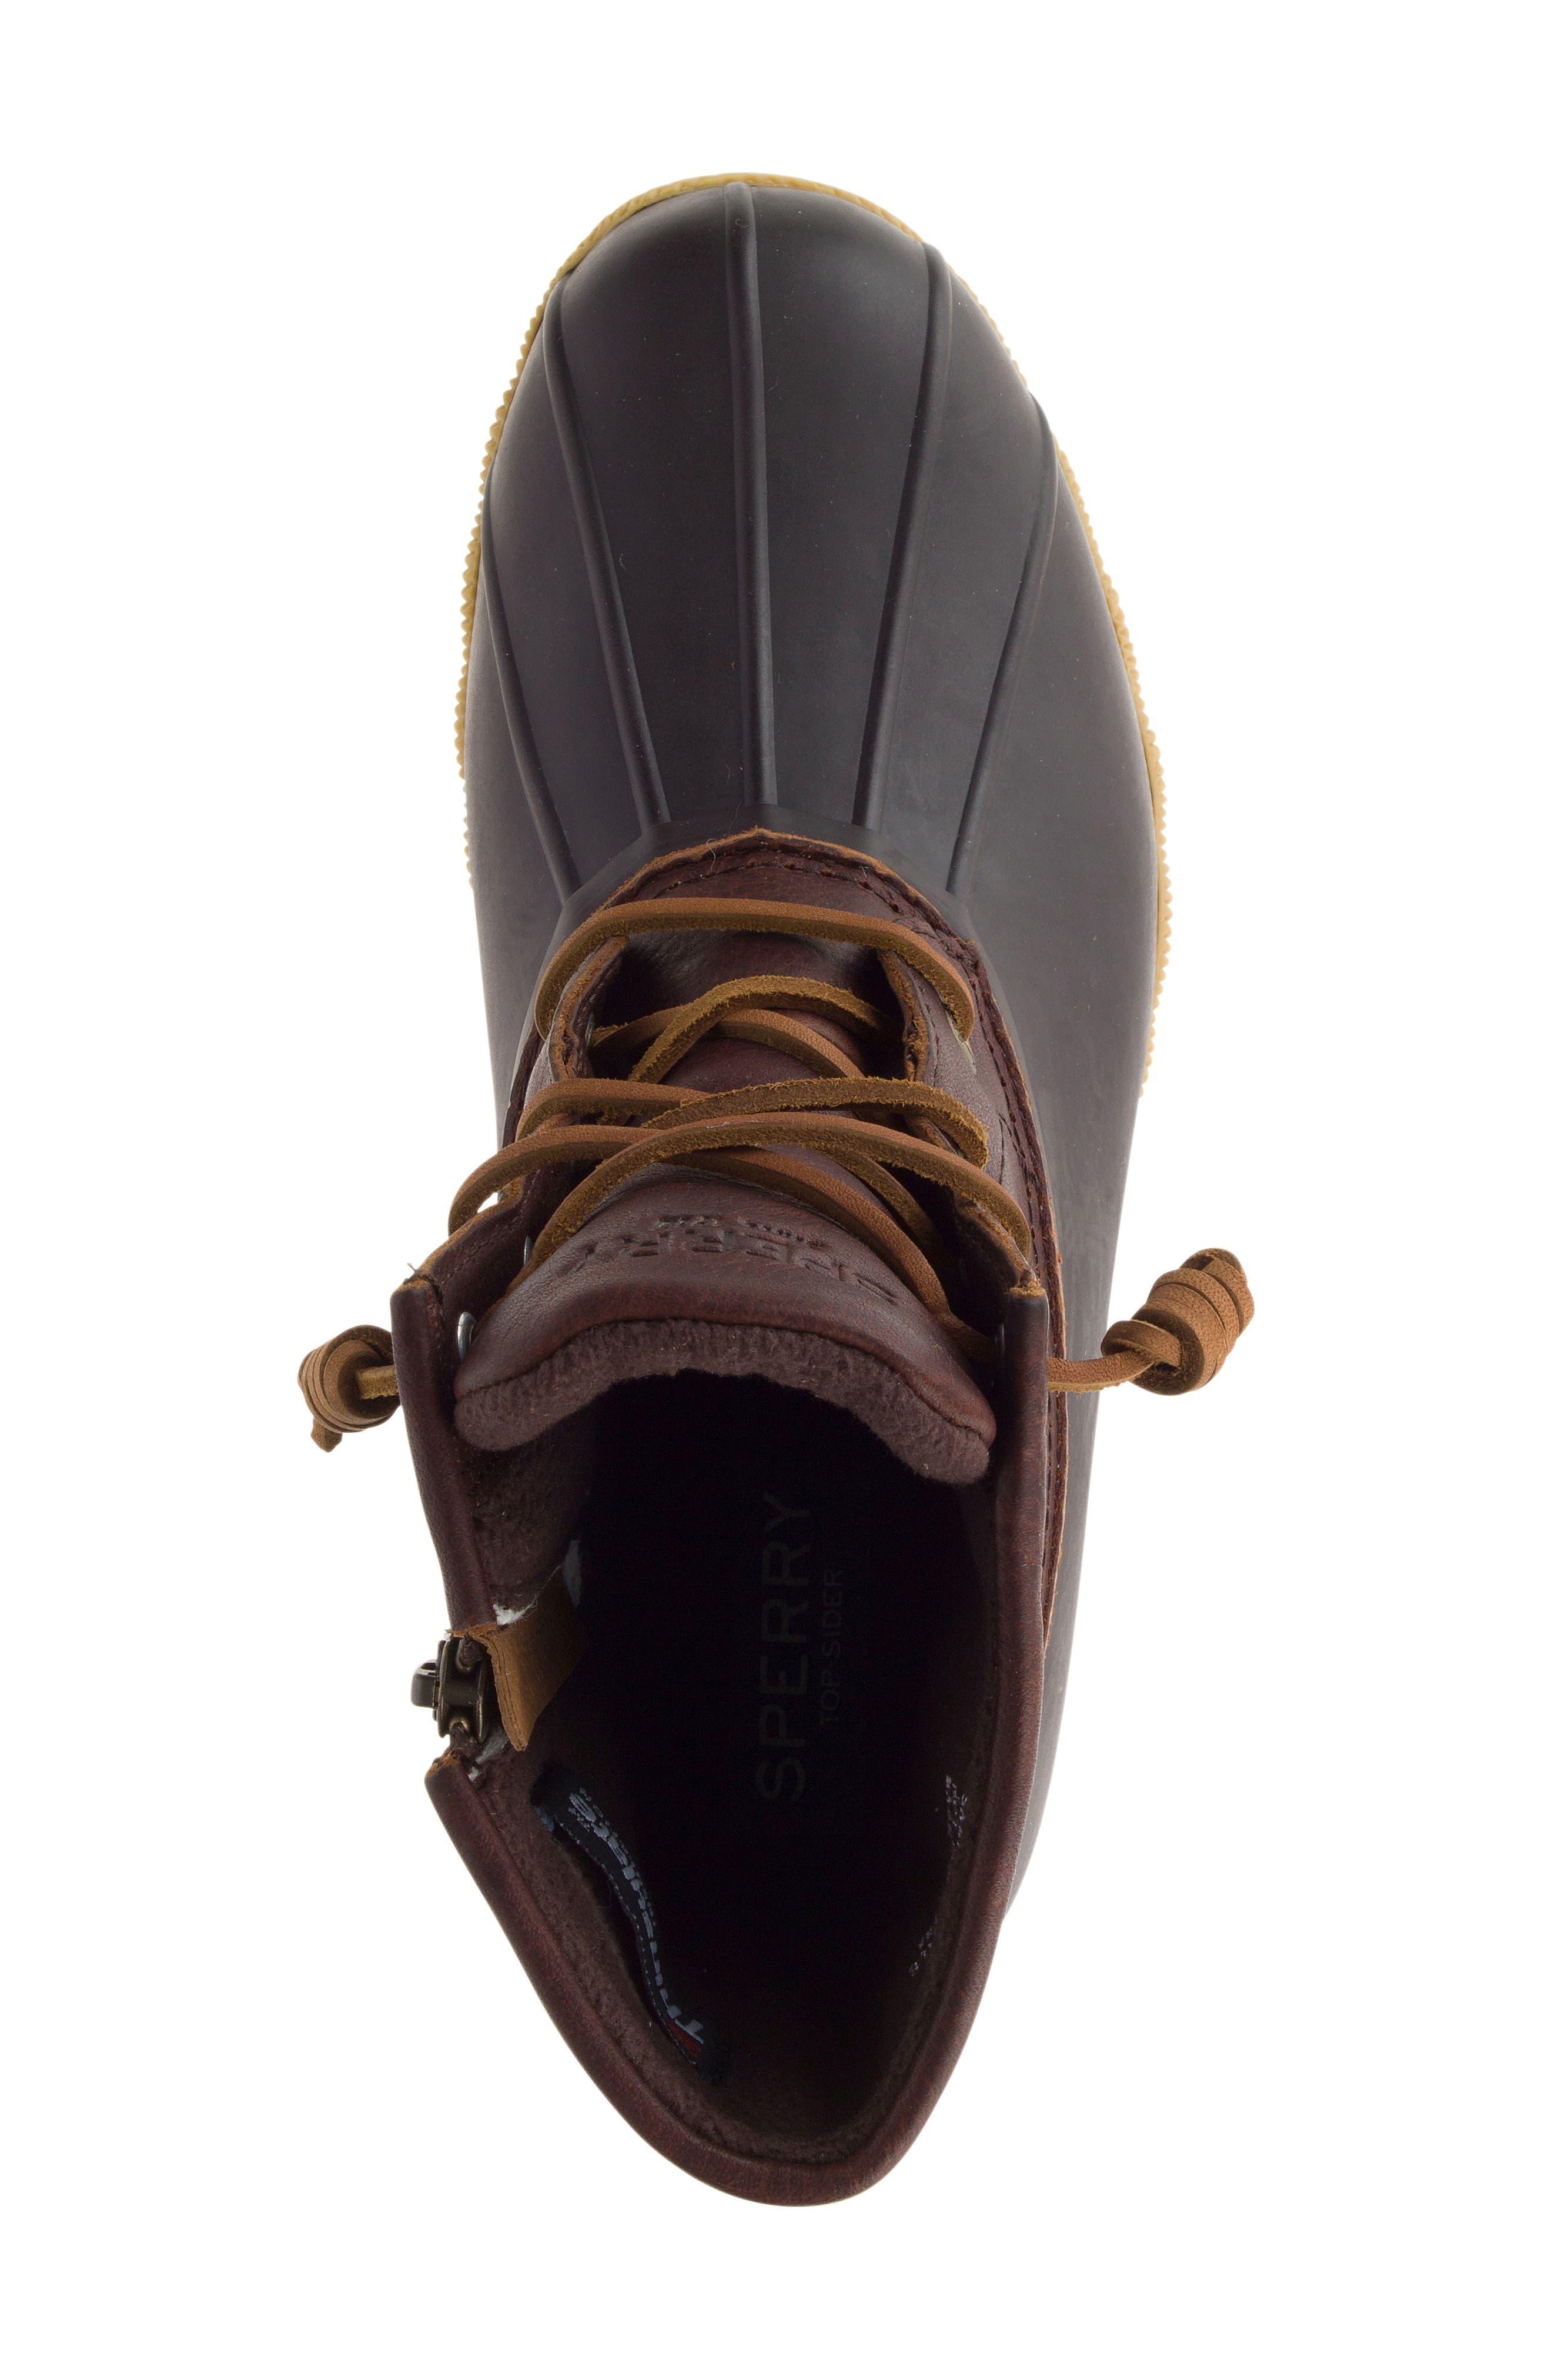 Saltwater Thinsulate<sup>™</sup> Waterproof Rain Boot,                             Alternate thumbnail 4, color,                             Tan/ Brown